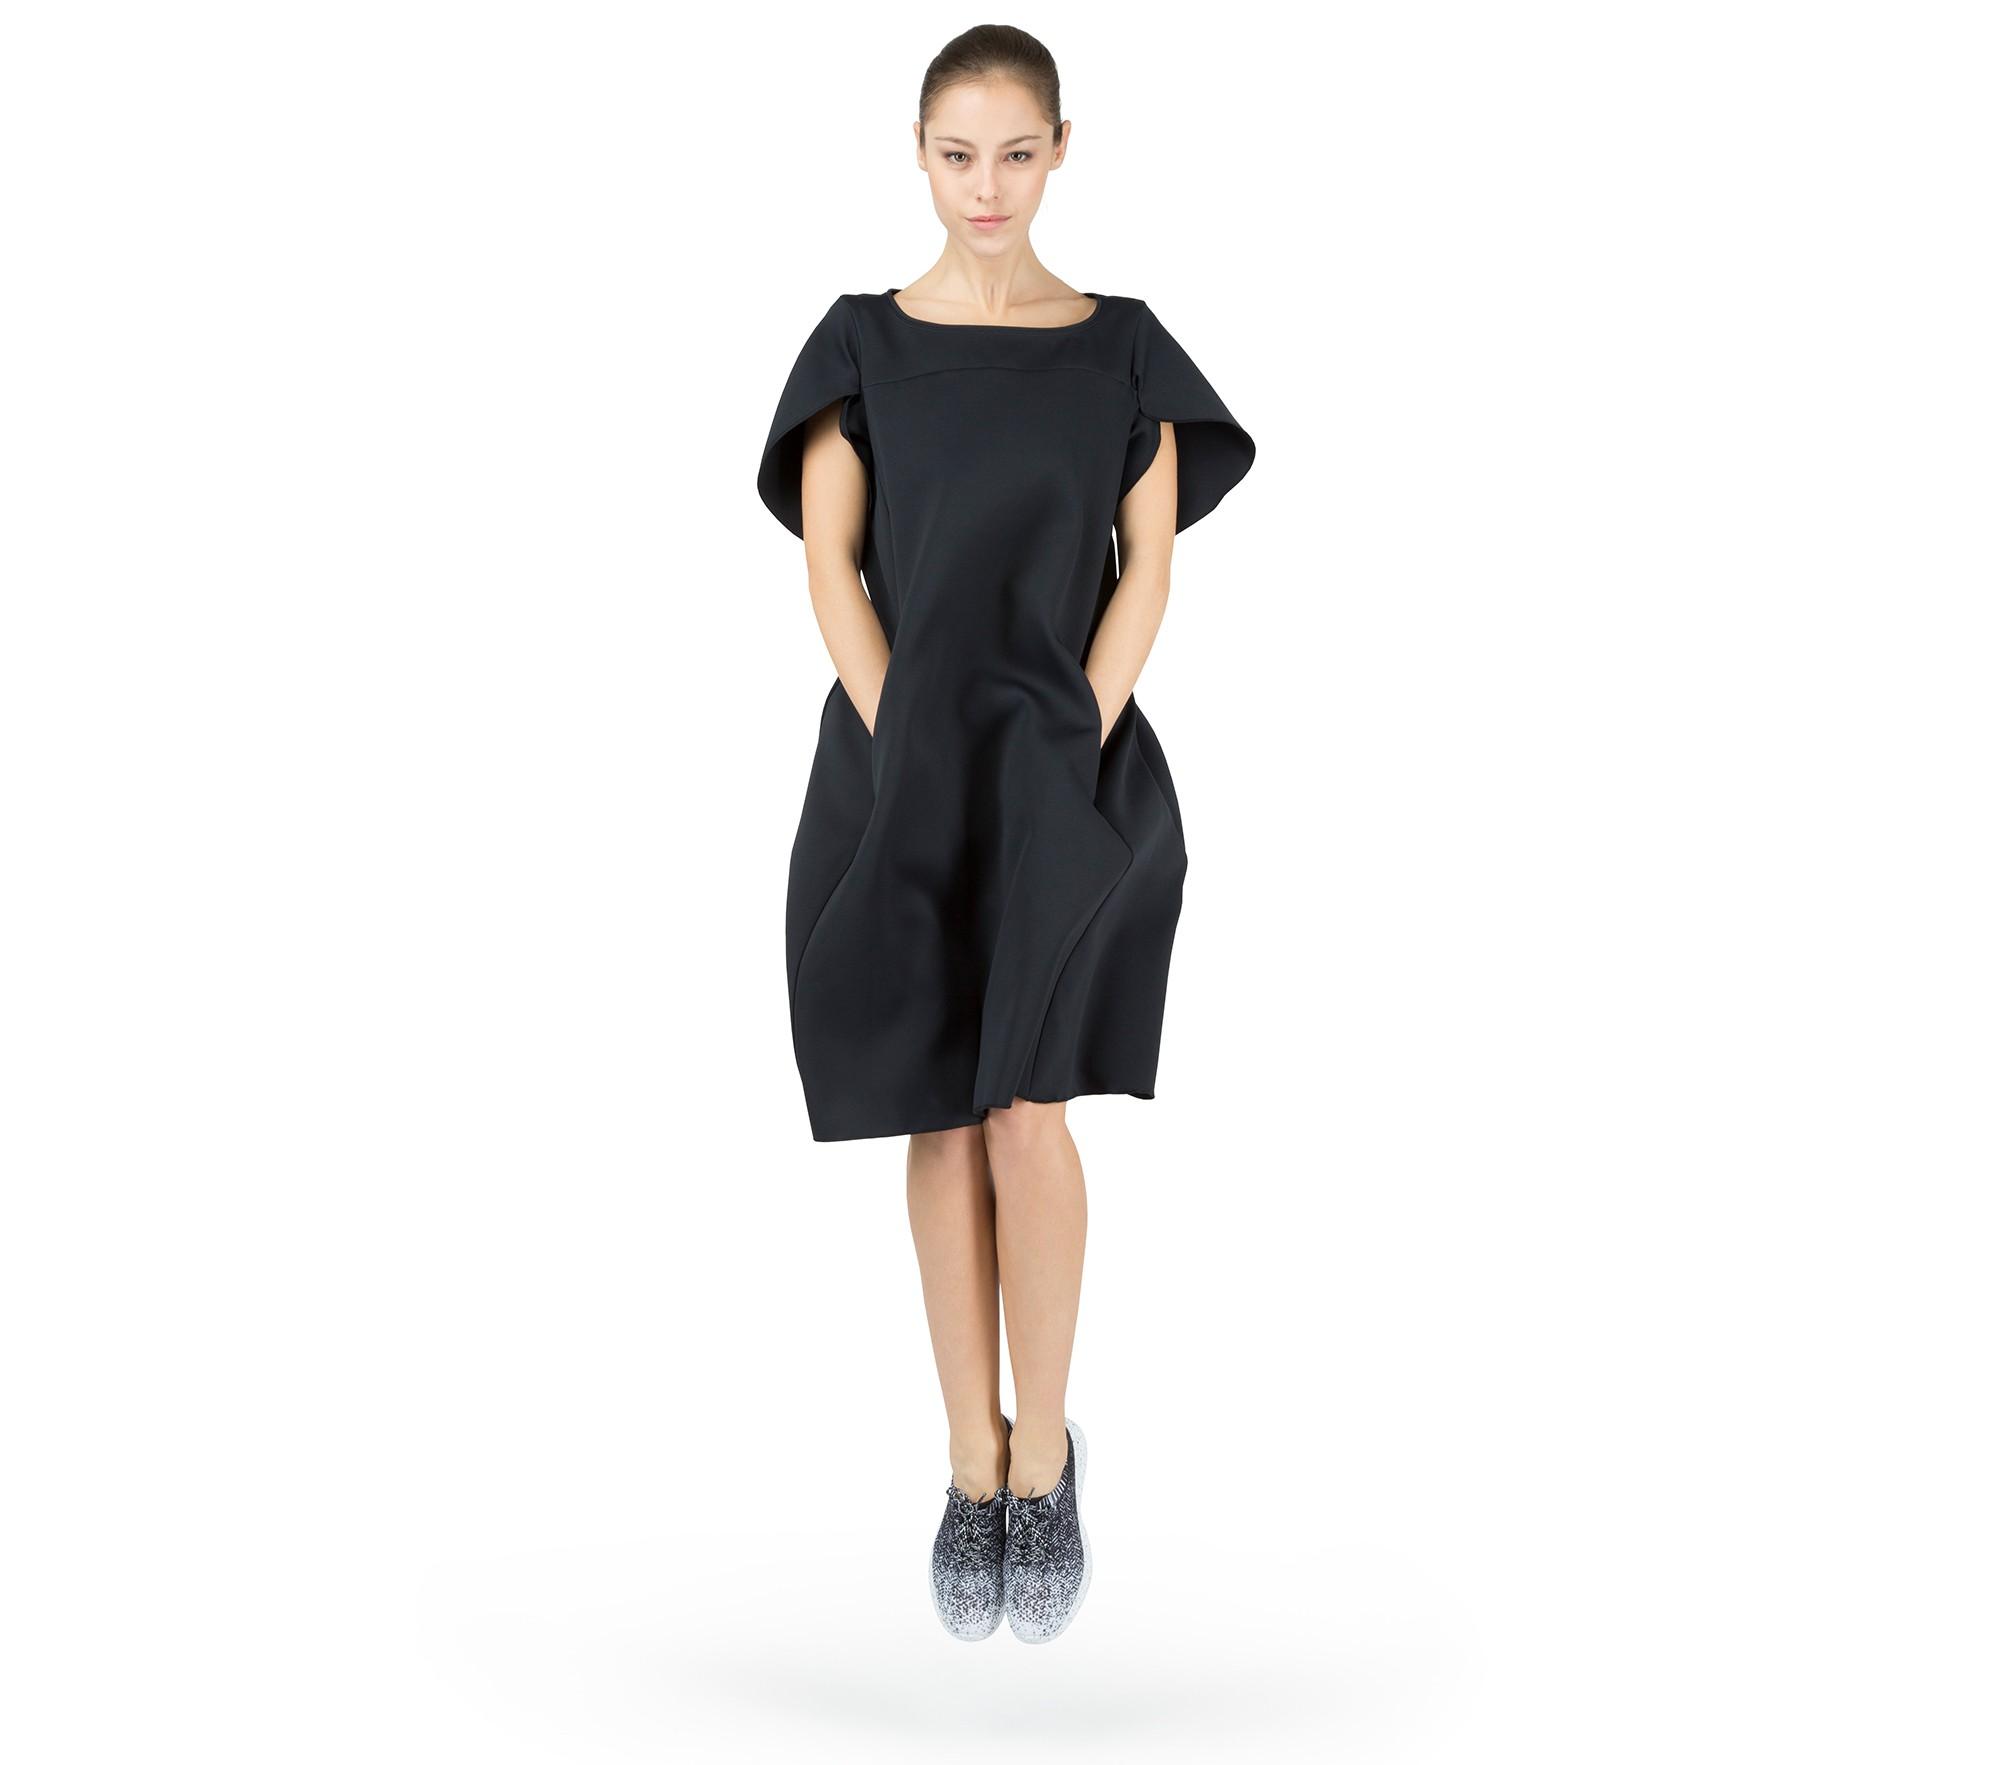 Neopren effect dress